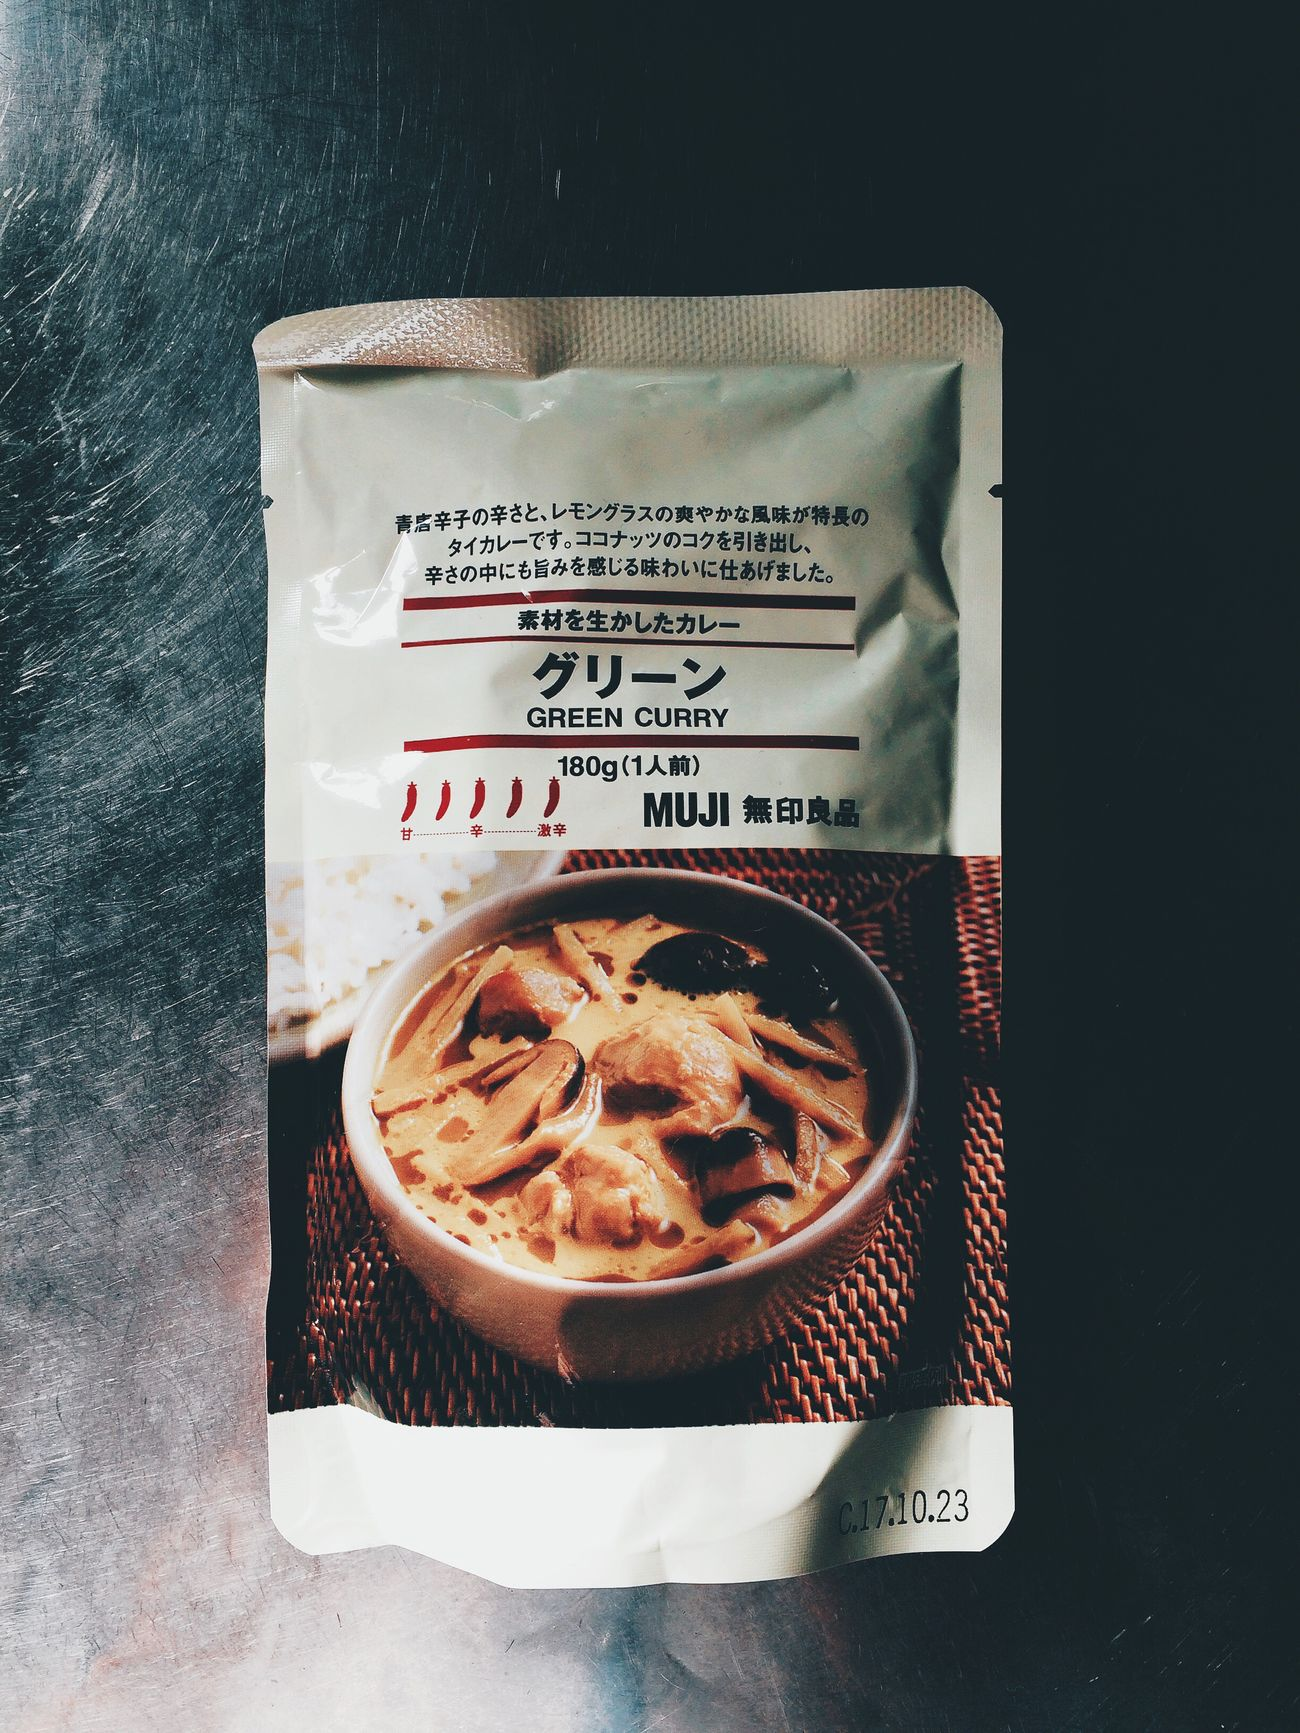 Muji Food IPhoneography Streamzoofamily 無印のタイカレー😌イエローの方が好きかな😌👍